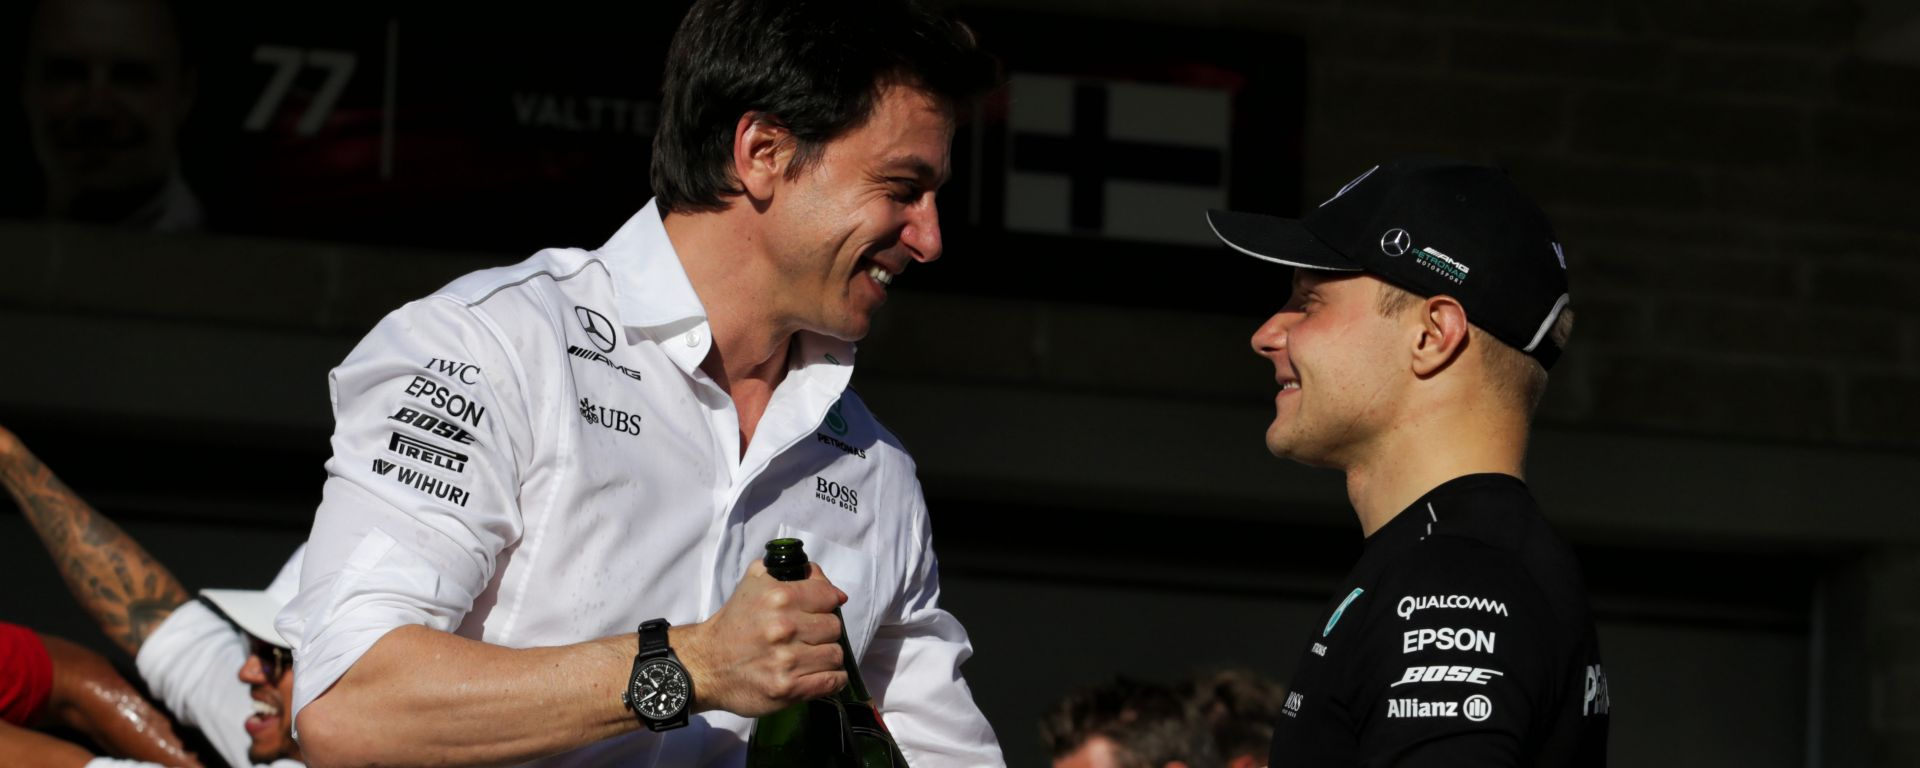 F1: Toto Wolff e Valtteri Bottas (Mercedes)